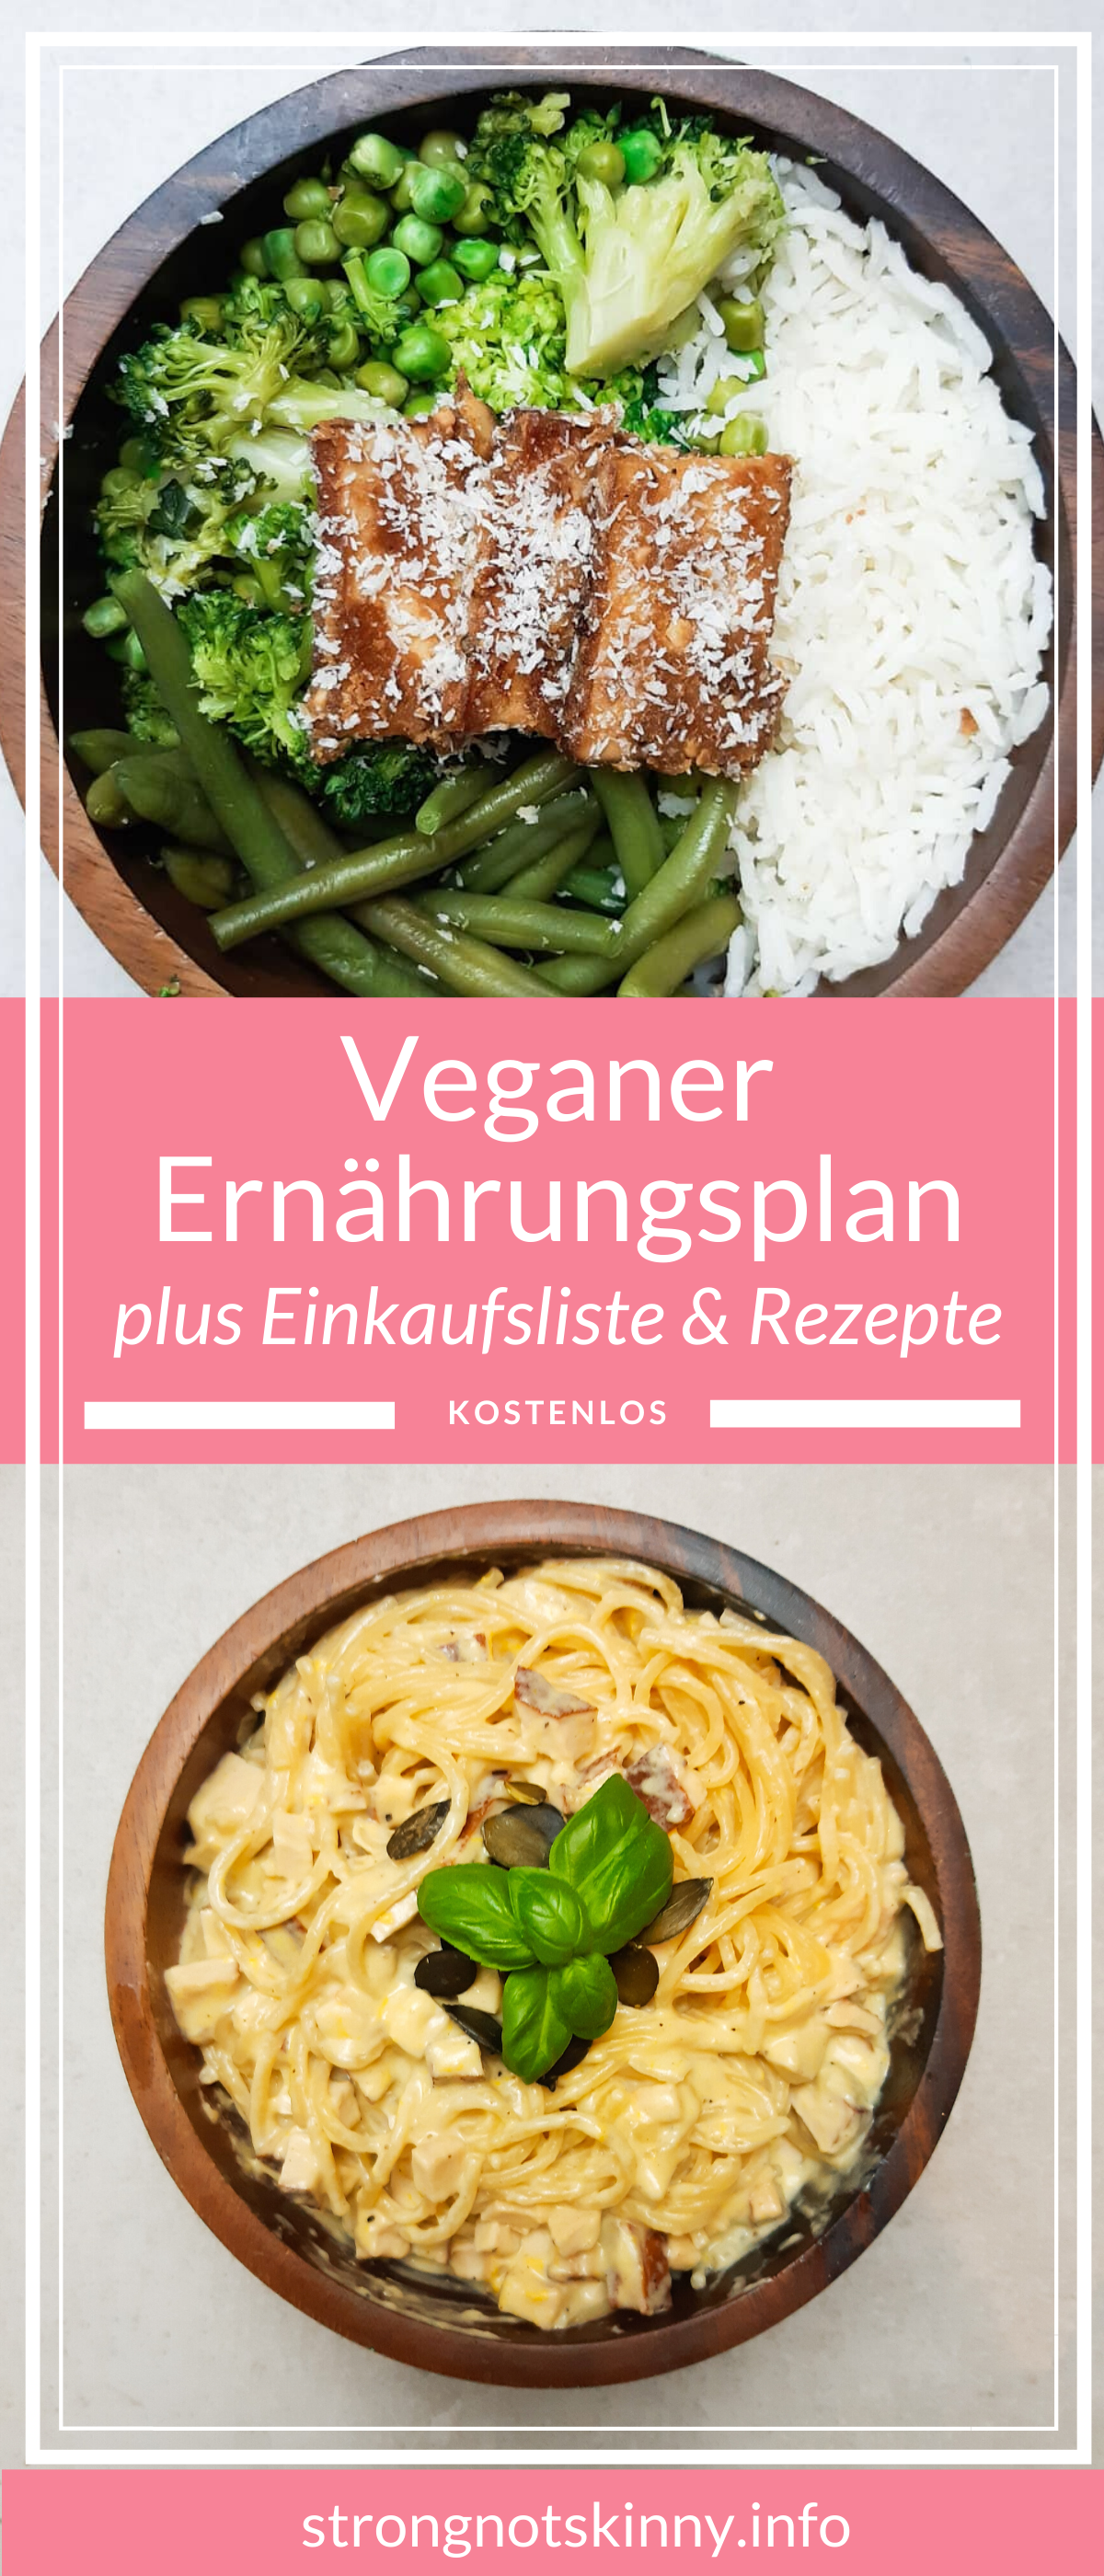 Vegan Abnehmen Guide Als Pdf Grunzeugprinzessin In 2020 Vegan Abnehmen Veganer Ernahrungsplan Rezepte